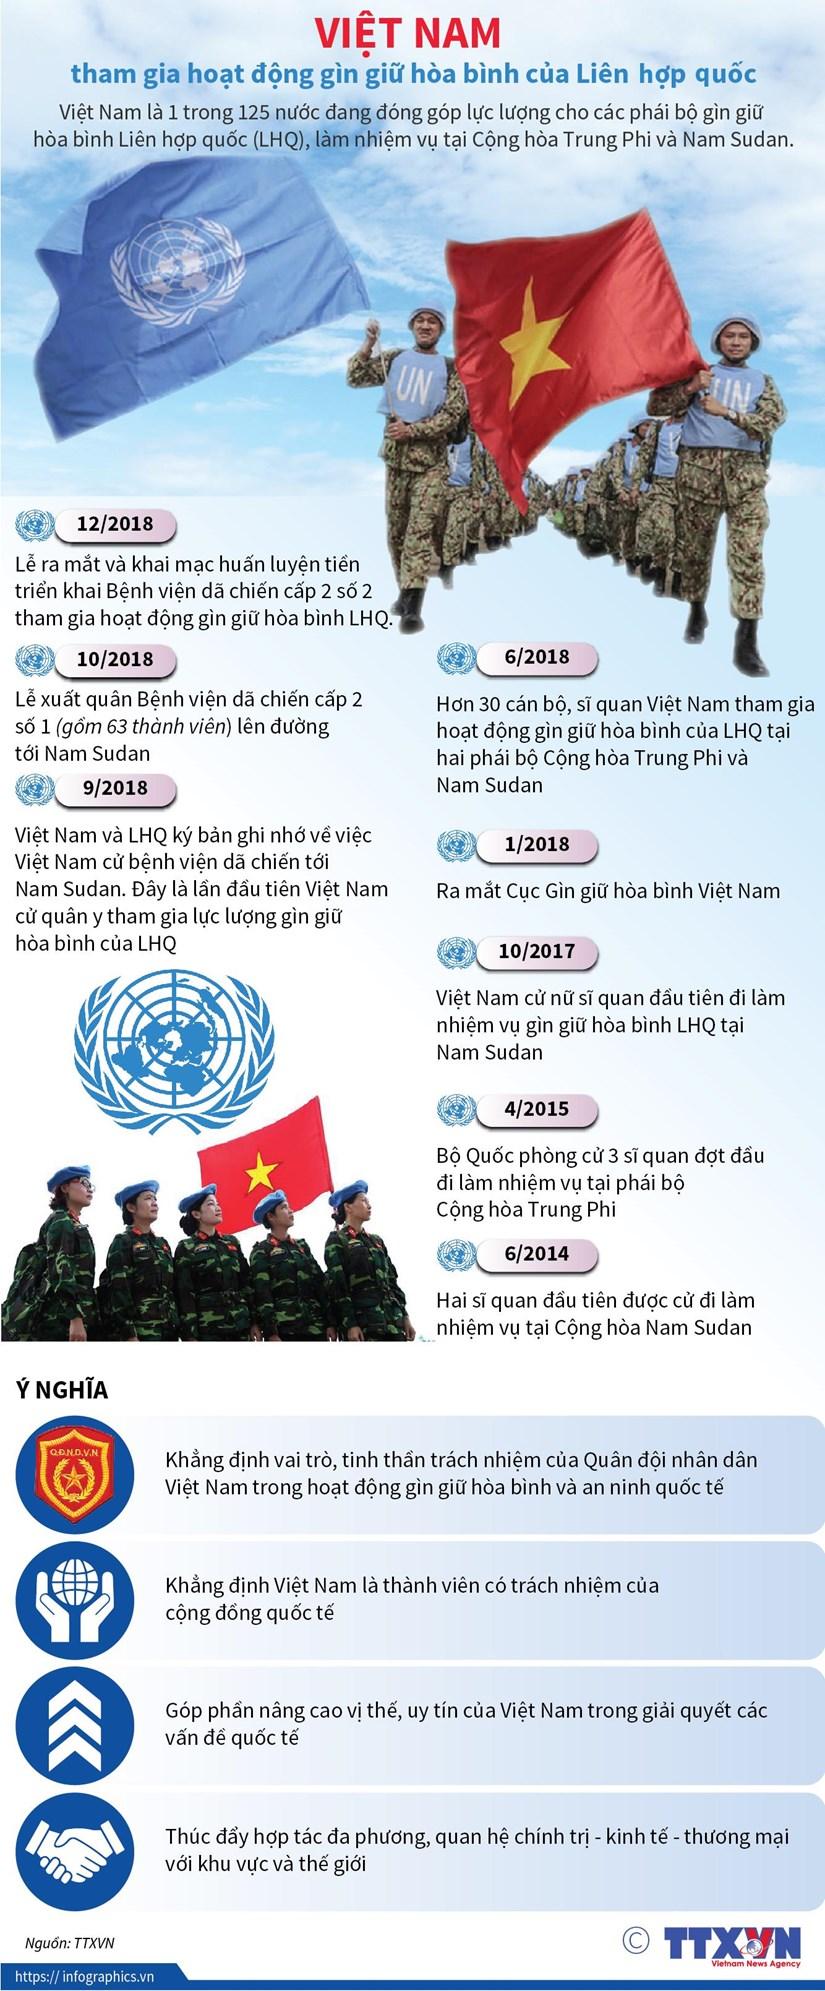 [Infographics] Viet Nam tham gia hoat dong gin giu hoa binh cua LHQ hinh anh 1